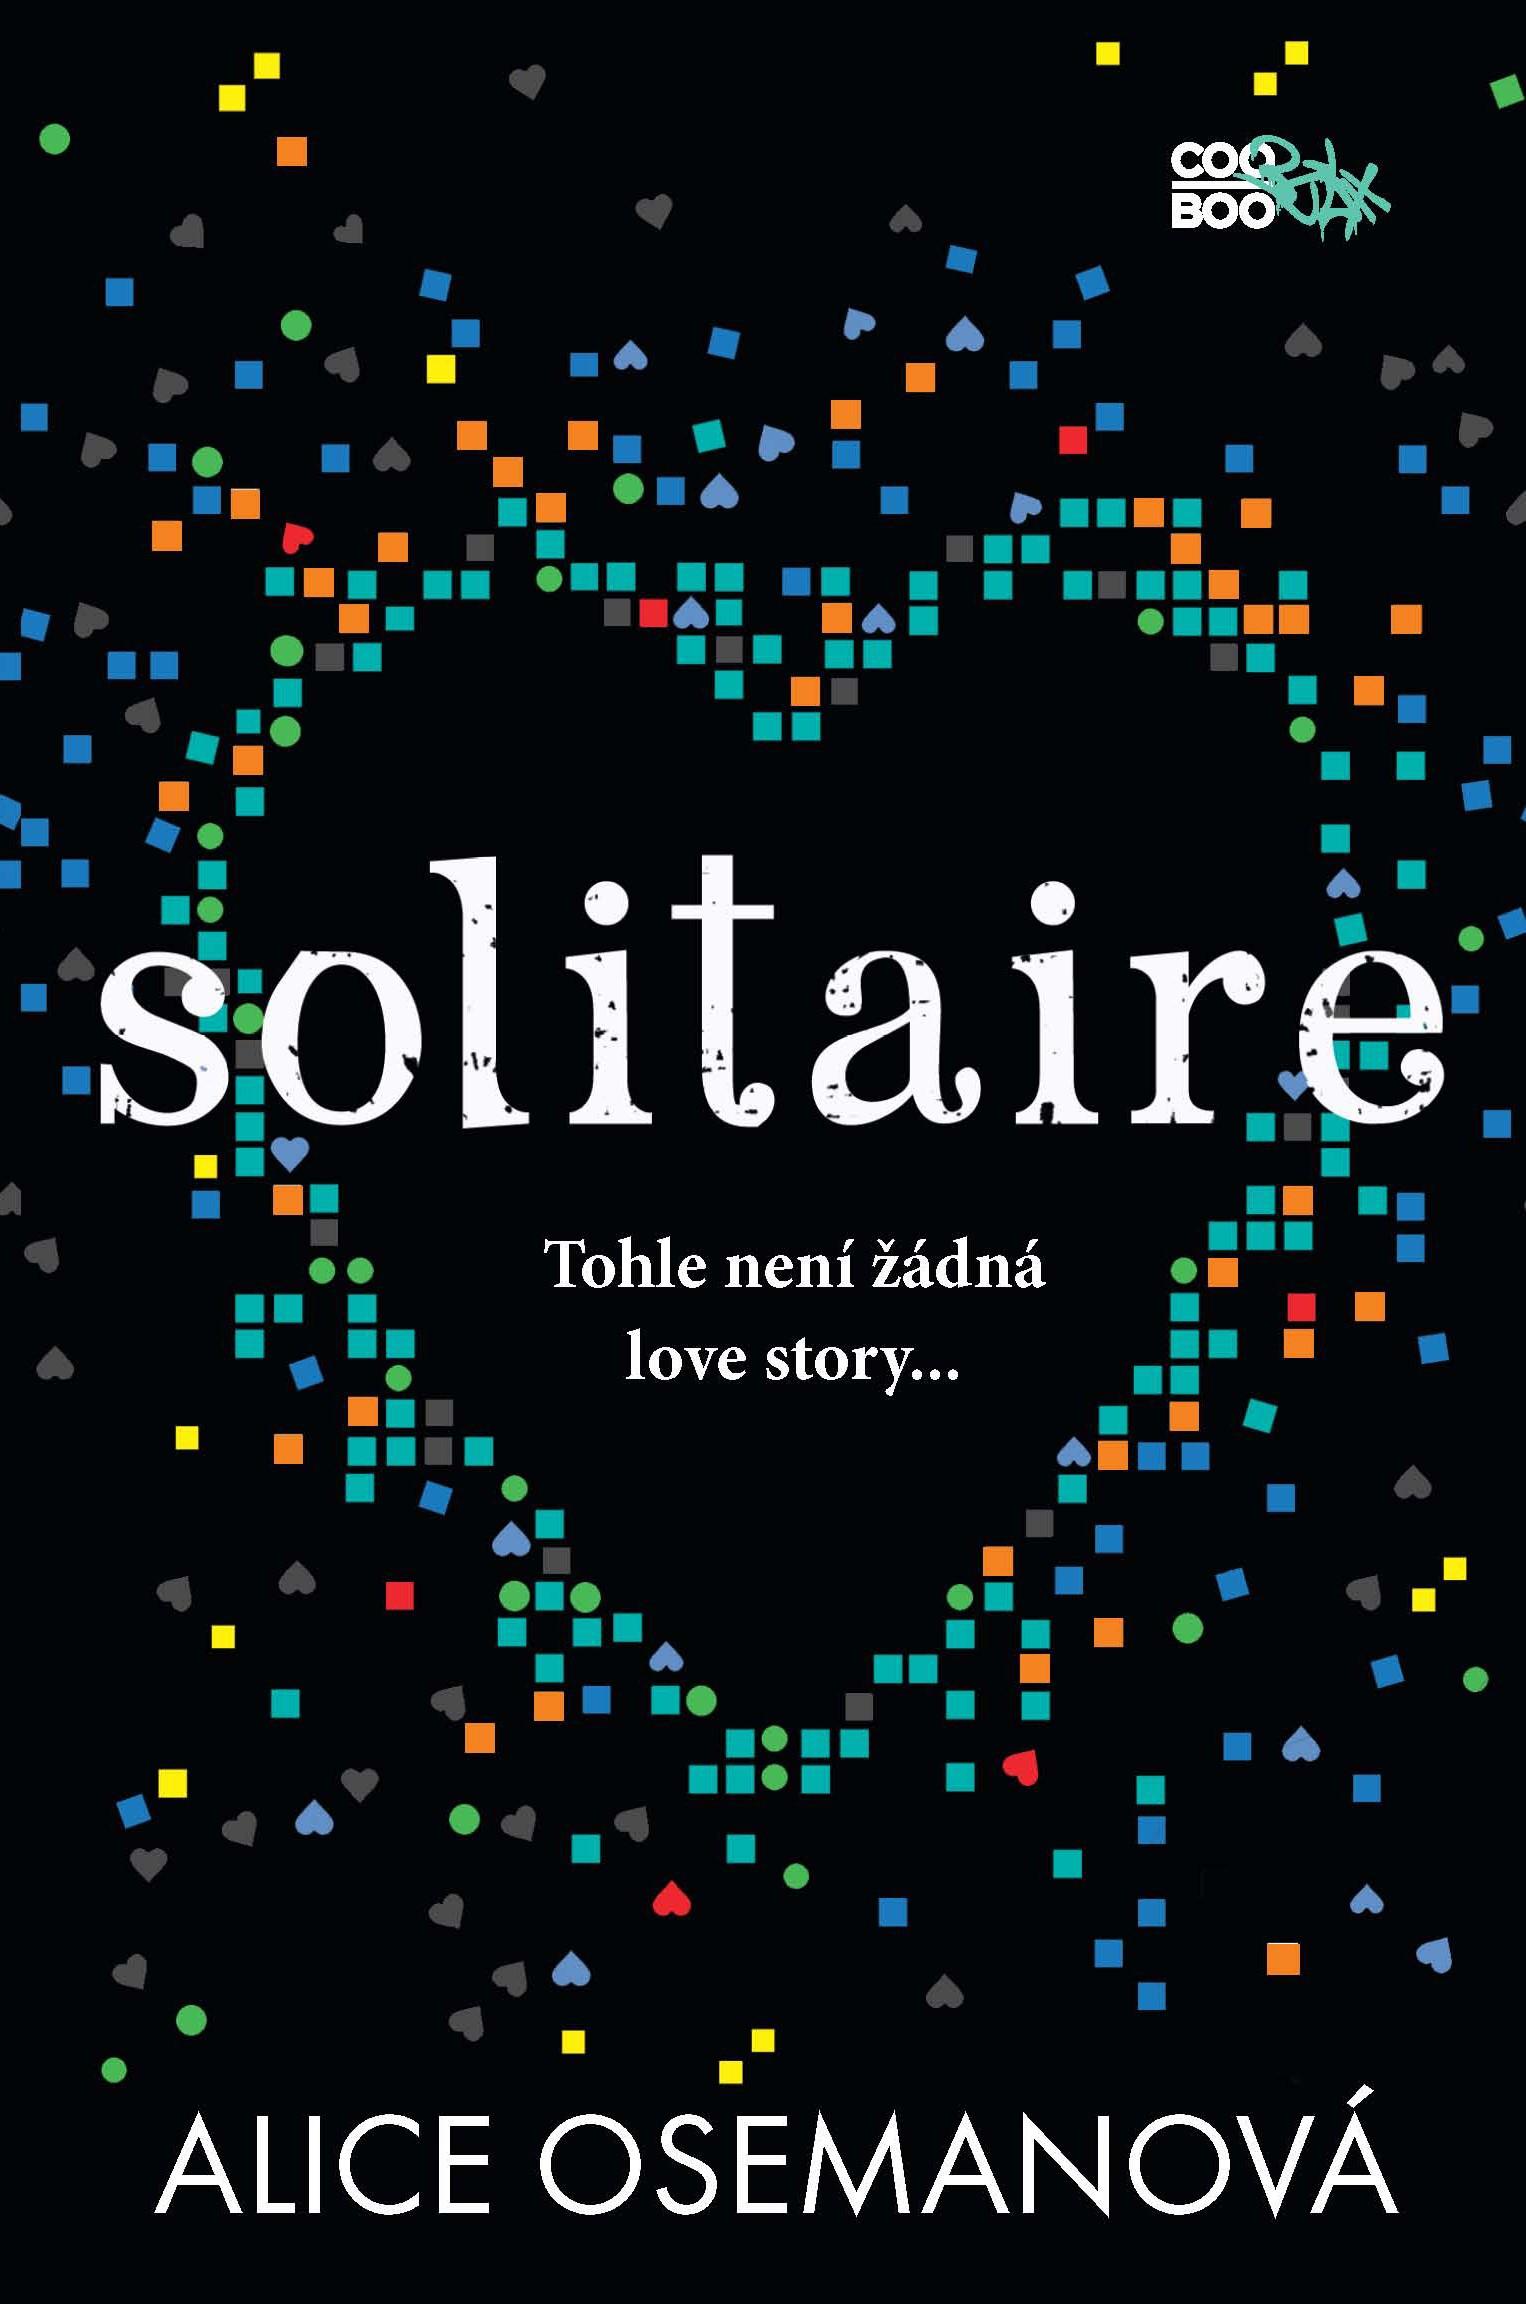 COOBOO Solitaire | Alice Osemanová